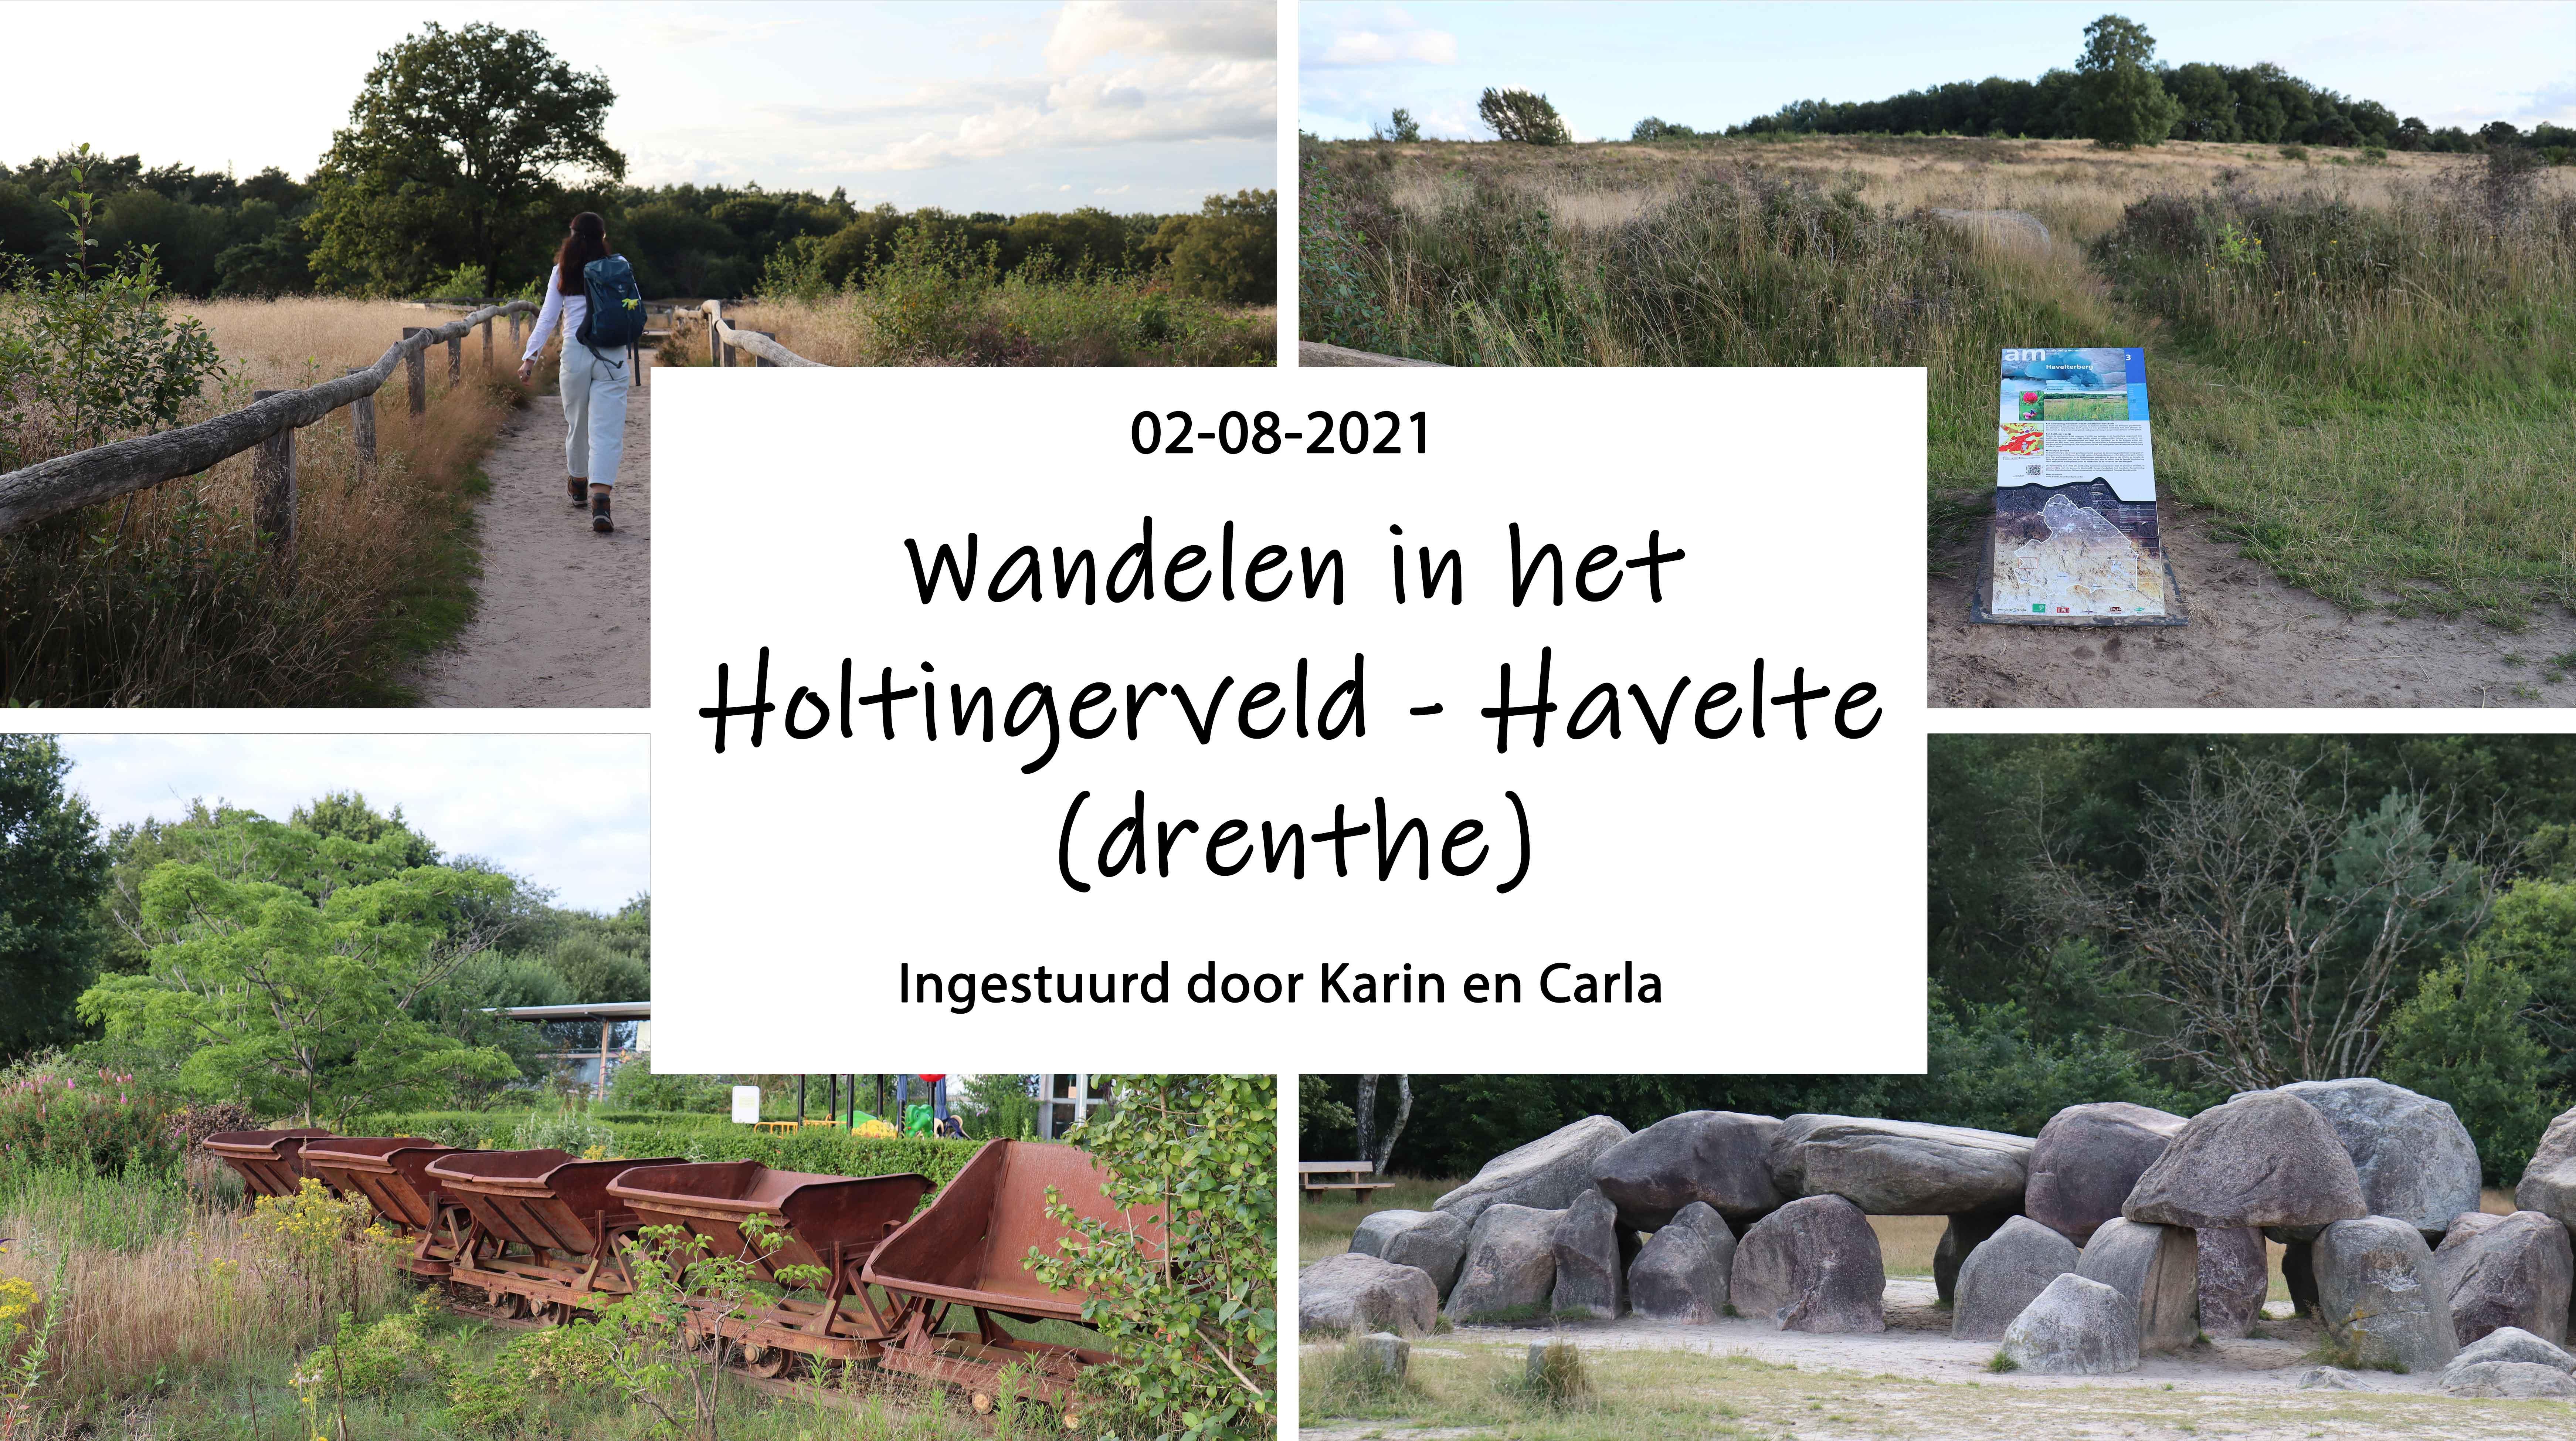 Wandelen in het Holtingerveld - Havelte